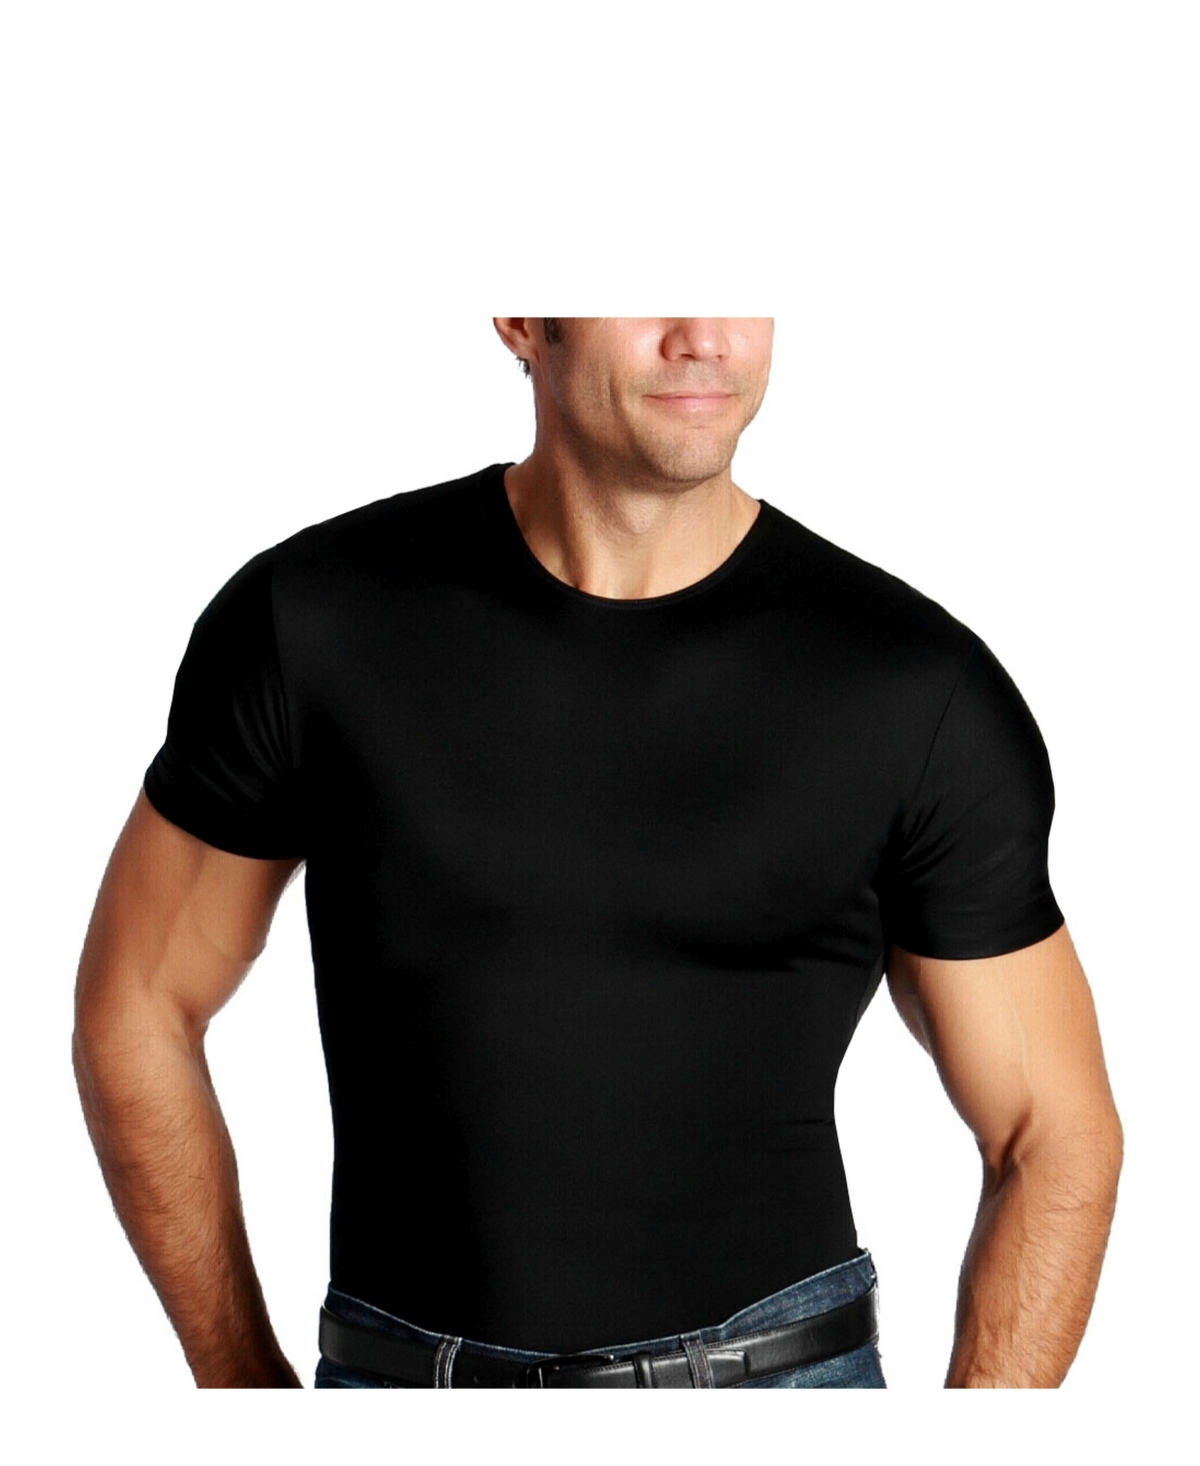 Insta Slim Men's Compression Short Sleeve Crew-Neck T-Shirt